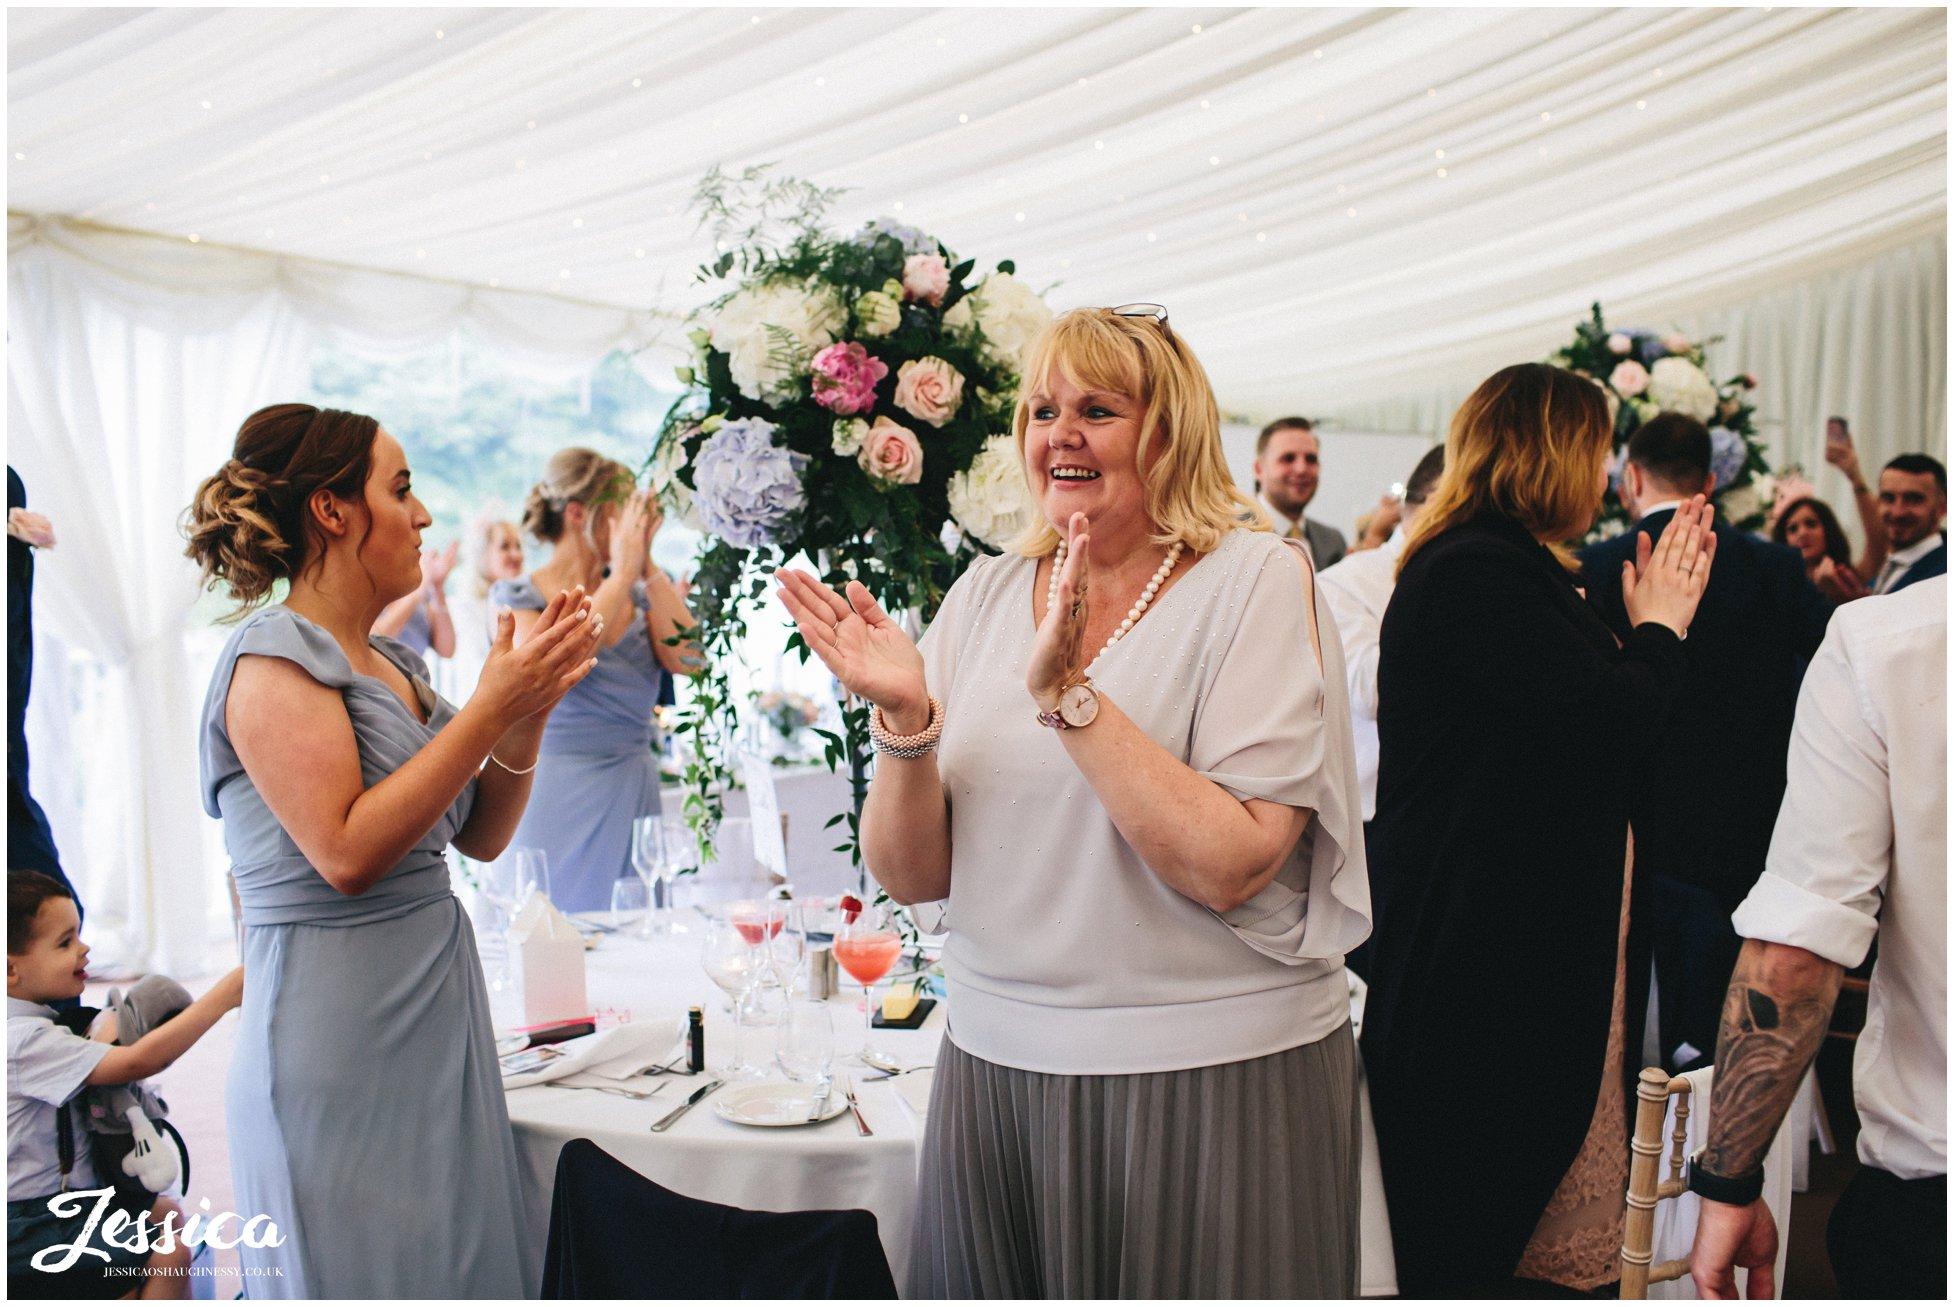 guests aplaude bride & groom walking into wedding room